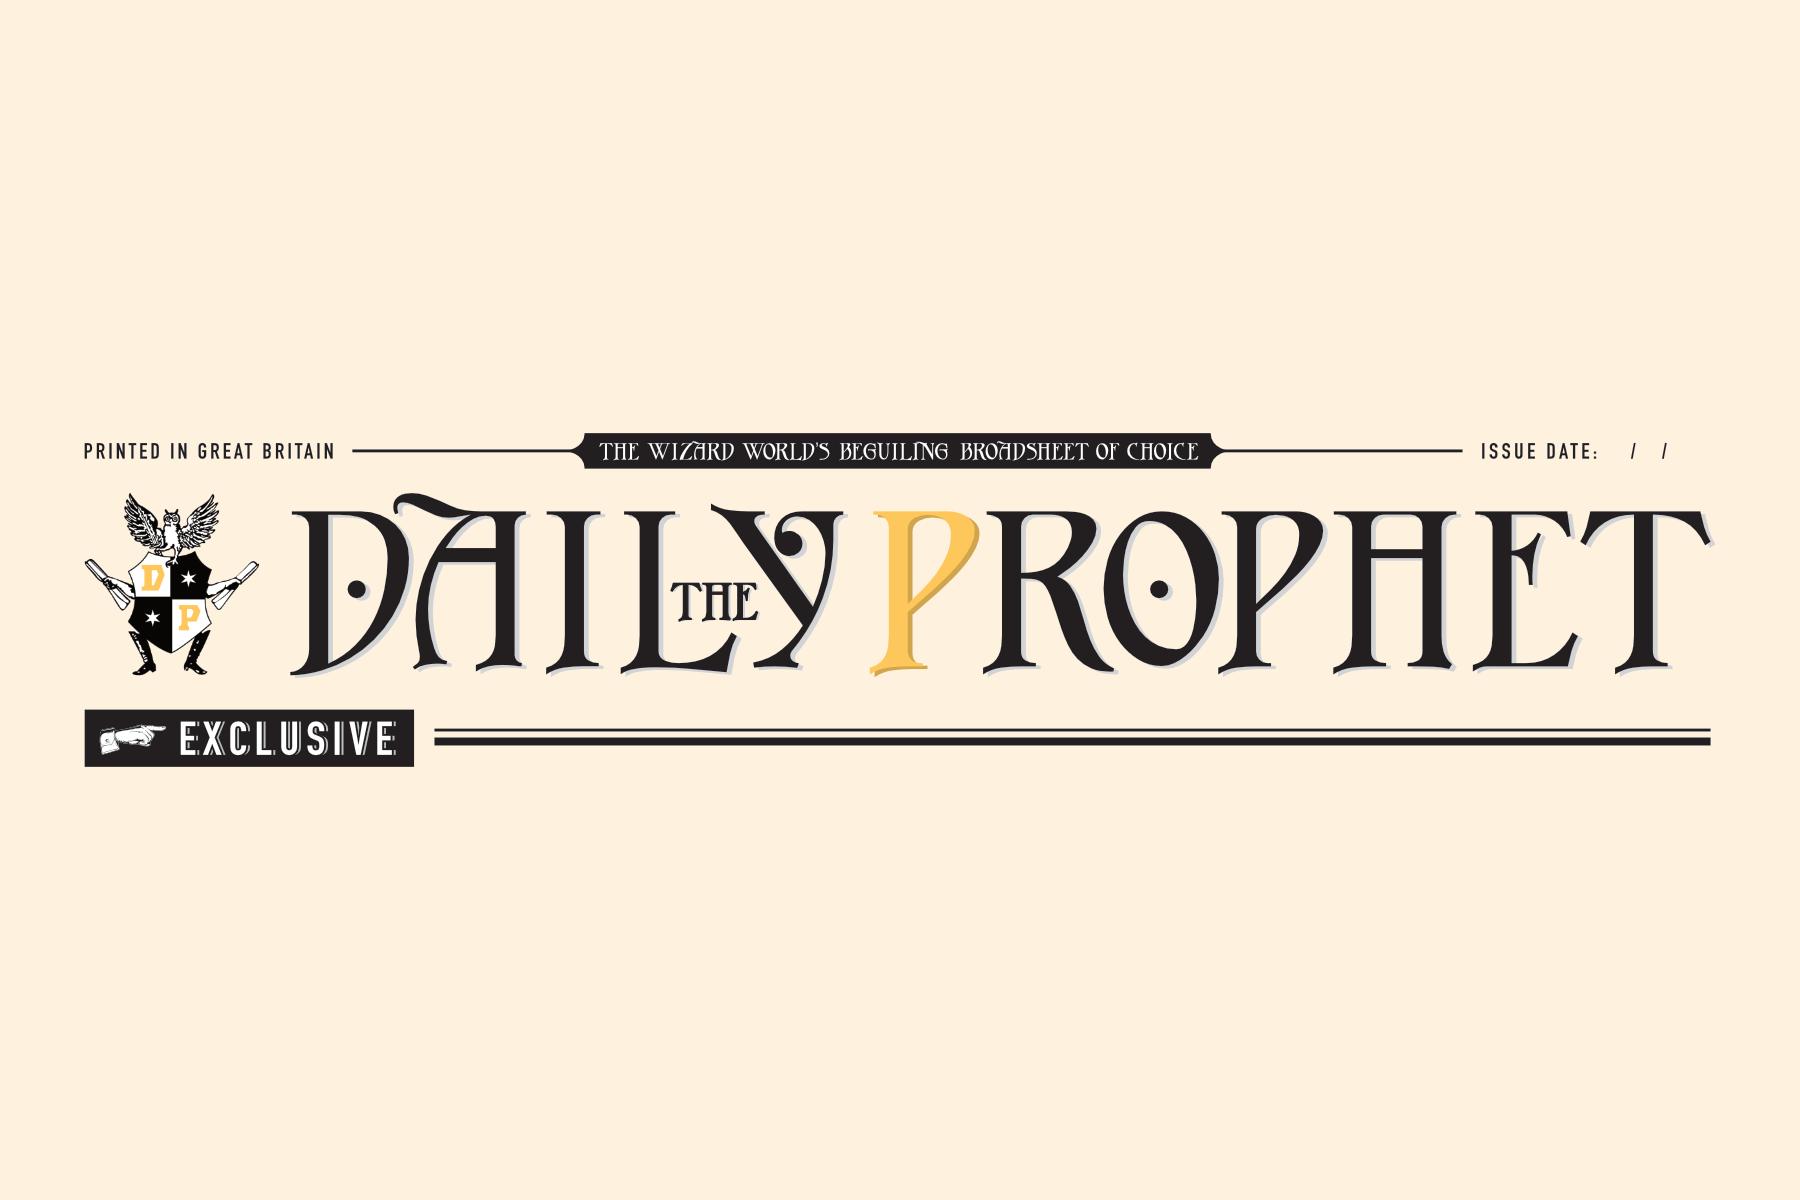 Harry Potter Newspaper Templates - PAPERZIP